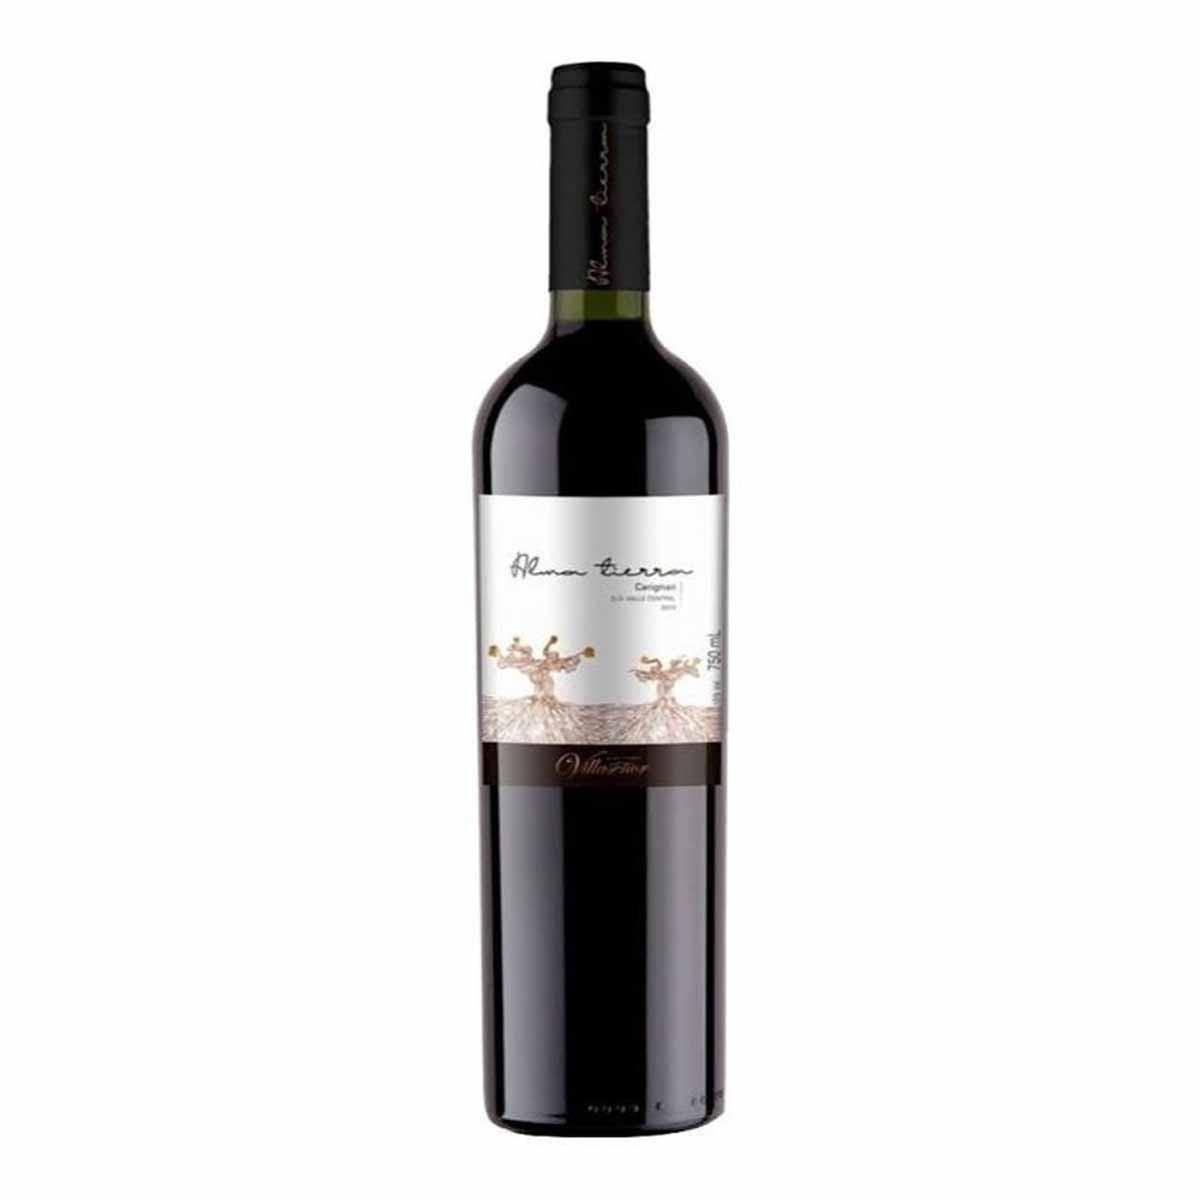 Vinho Tinto Chileno Alma Tierra Carignan 2018